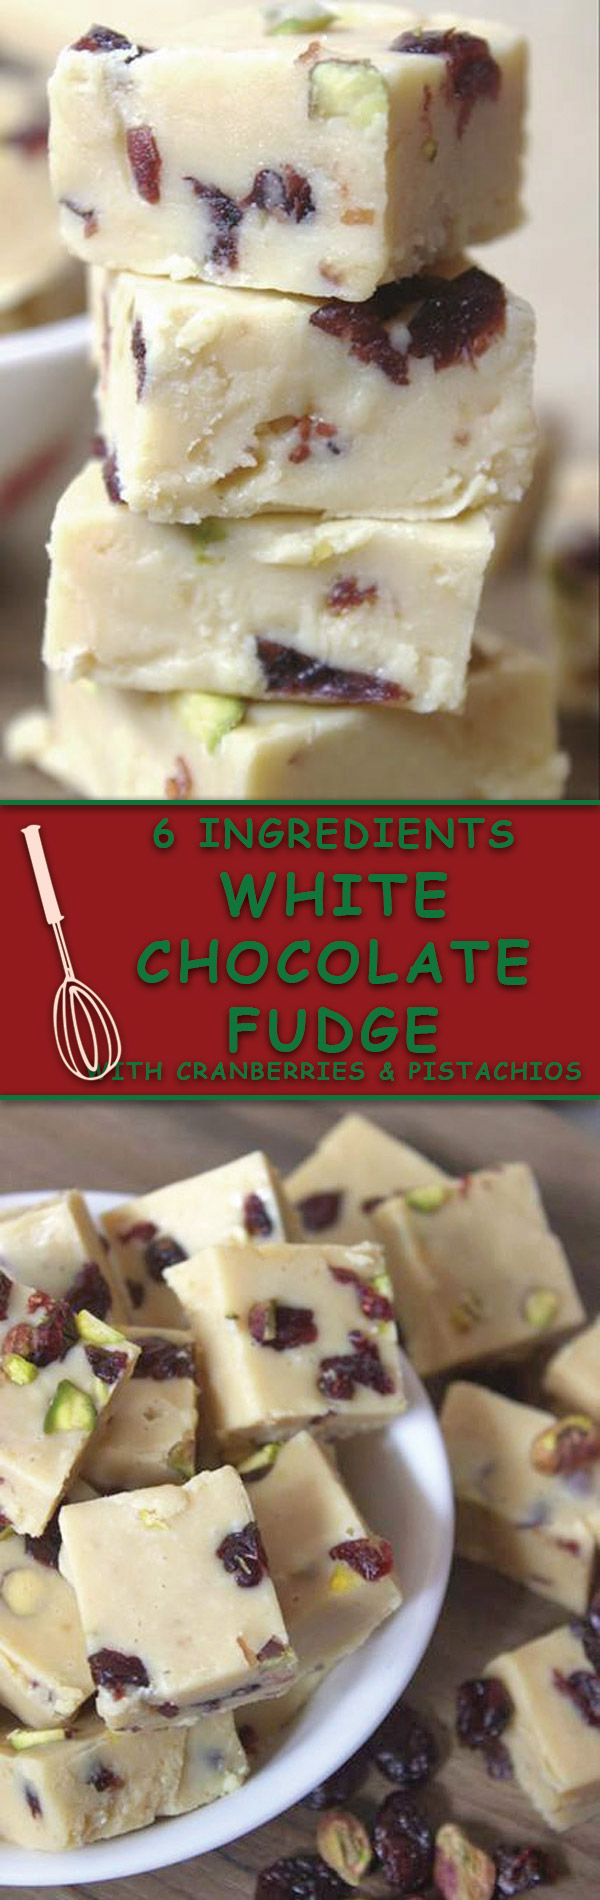 Easy 6 Ingredient White Chocolate Cranberry Pistachio Fudge ...